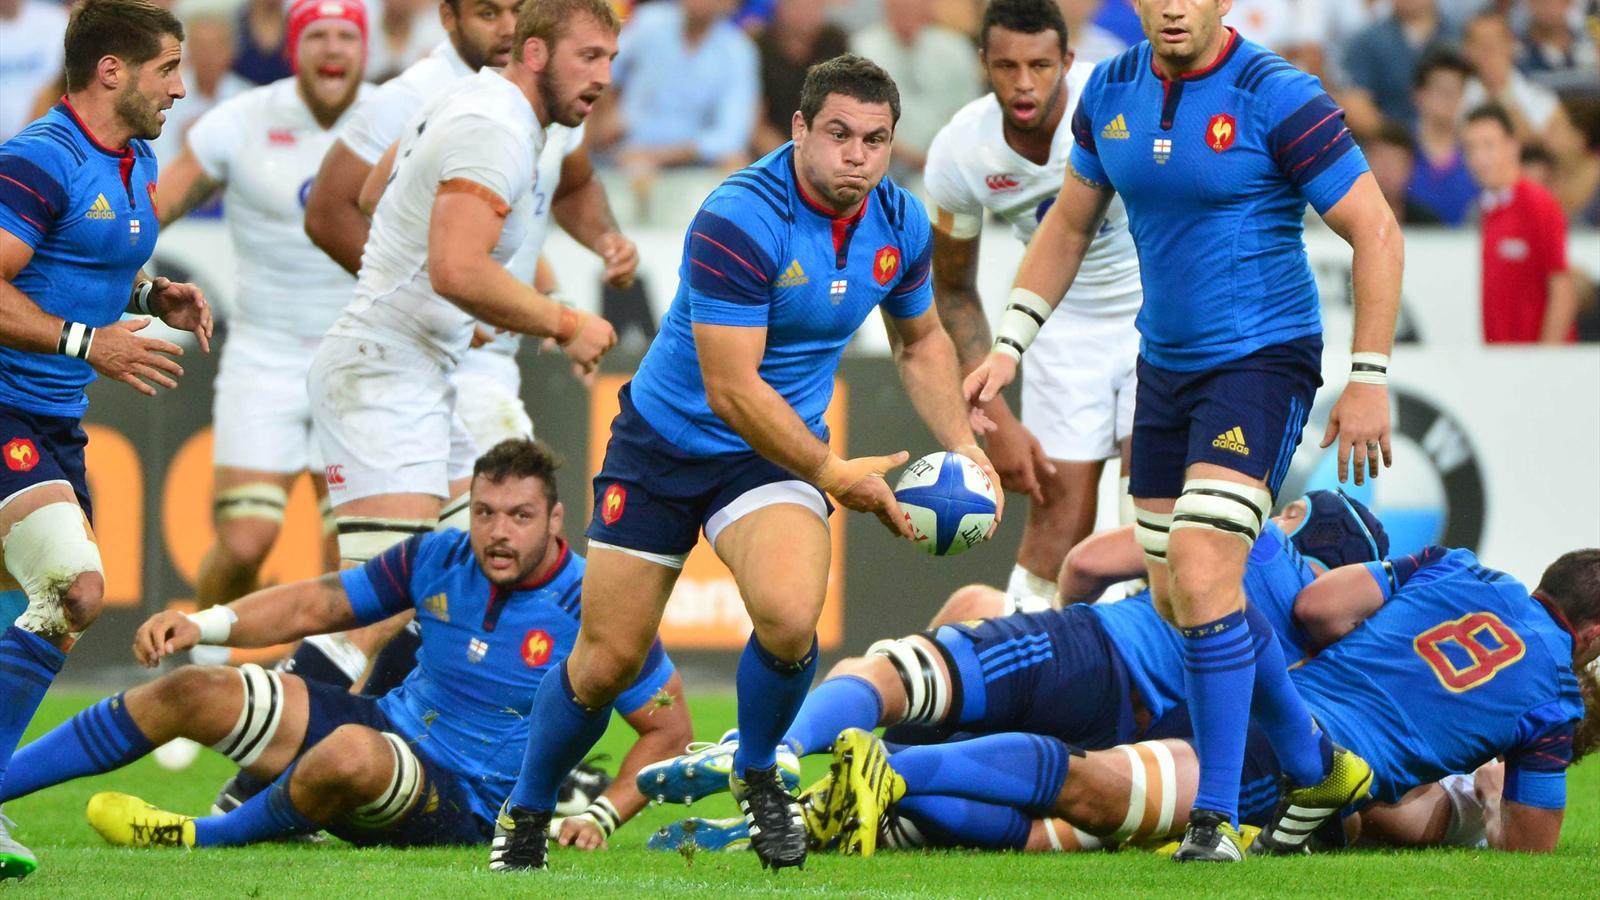 Guilhem Guirado (XV de France) face à l'Angleterre - 22 août 2015